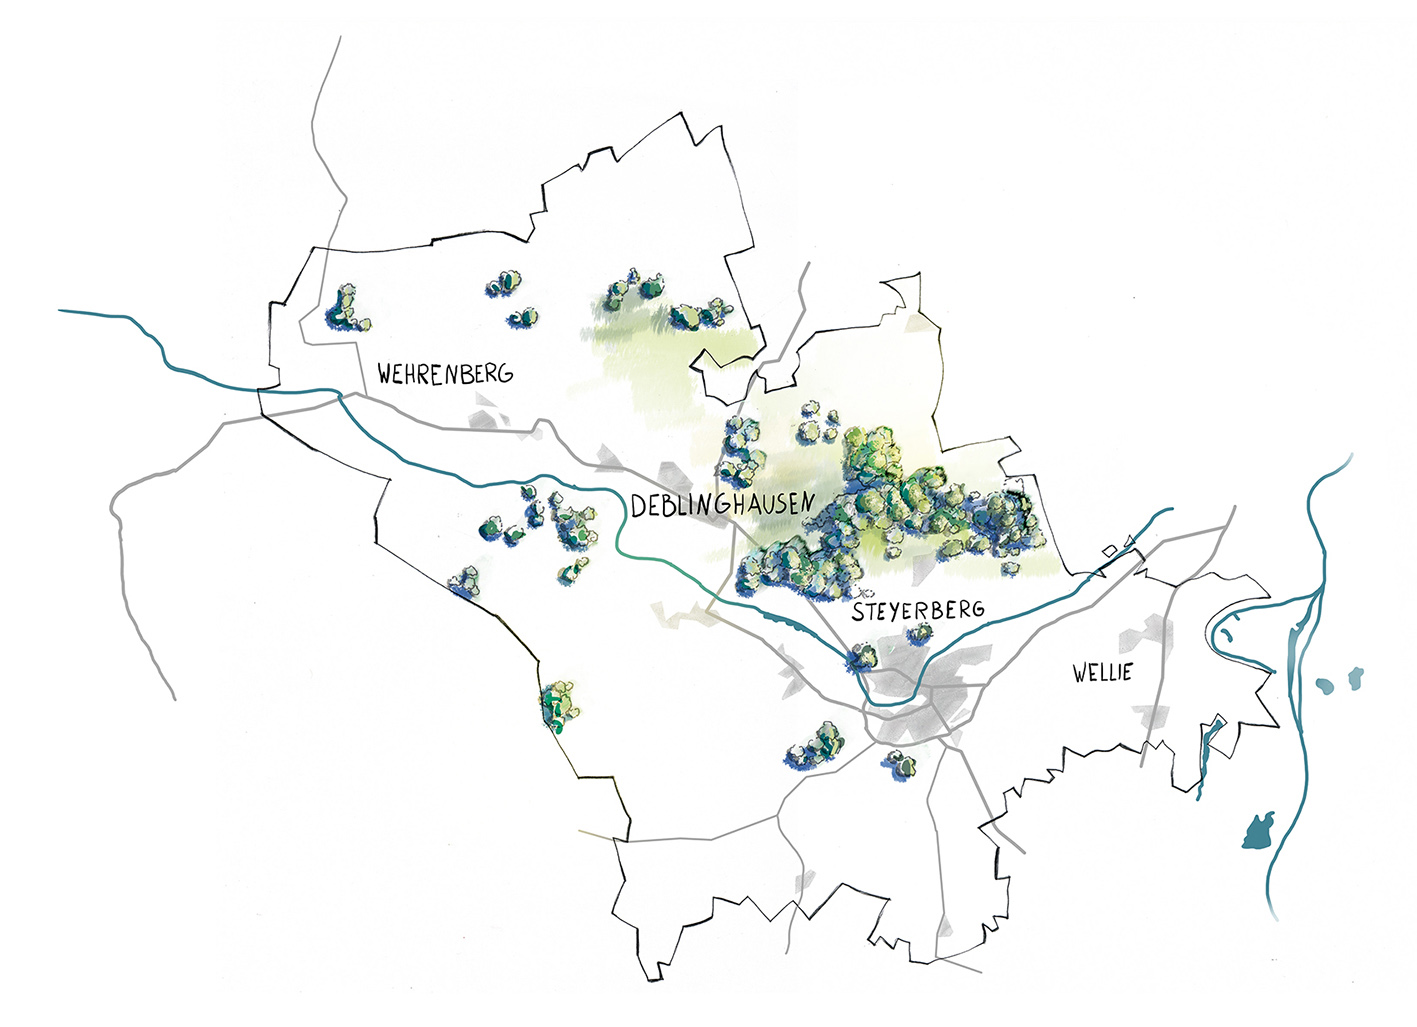 Illustration-Karte-Flecken-Steyerberg-mit-Ortsnamen